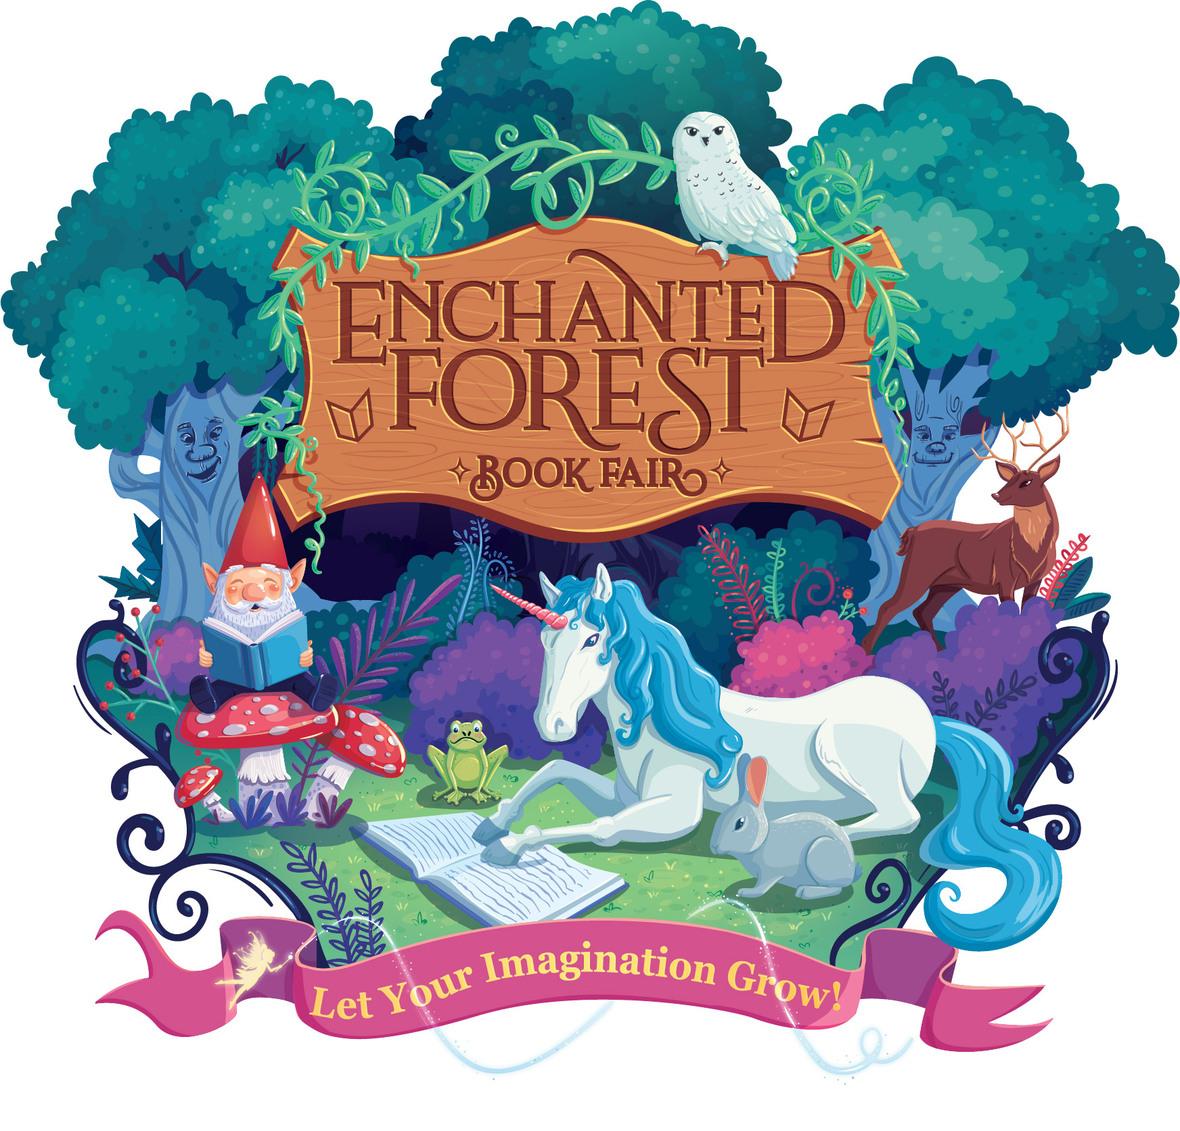 Fall 2018 Book Fair - Enchanted Forest